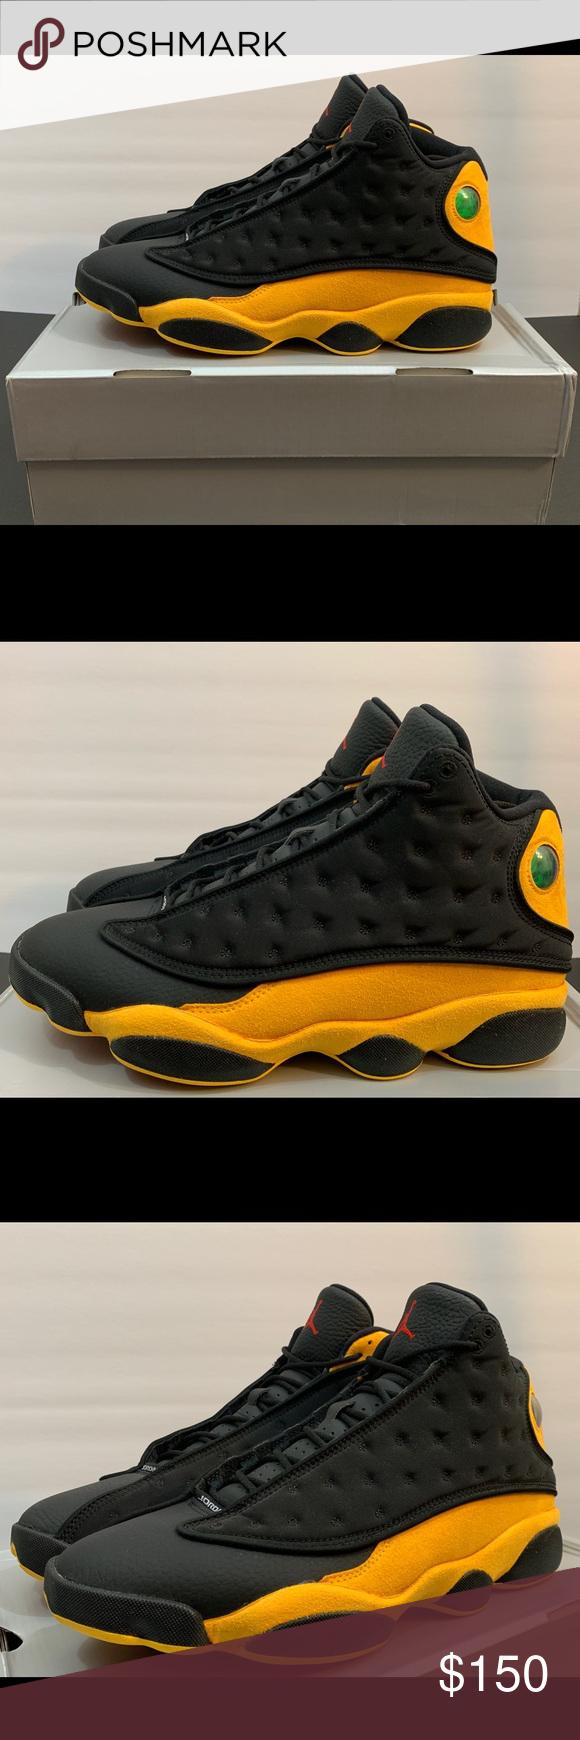 6e68e64c476 Air Jordan XIII 13 Retro Class 2002 Melo Size 11 Air Jordan XIII 13 Retro  Class 2002 Melo Black Yellow 414571-035 Men's Size 11 Jordan Shoes Sneakers